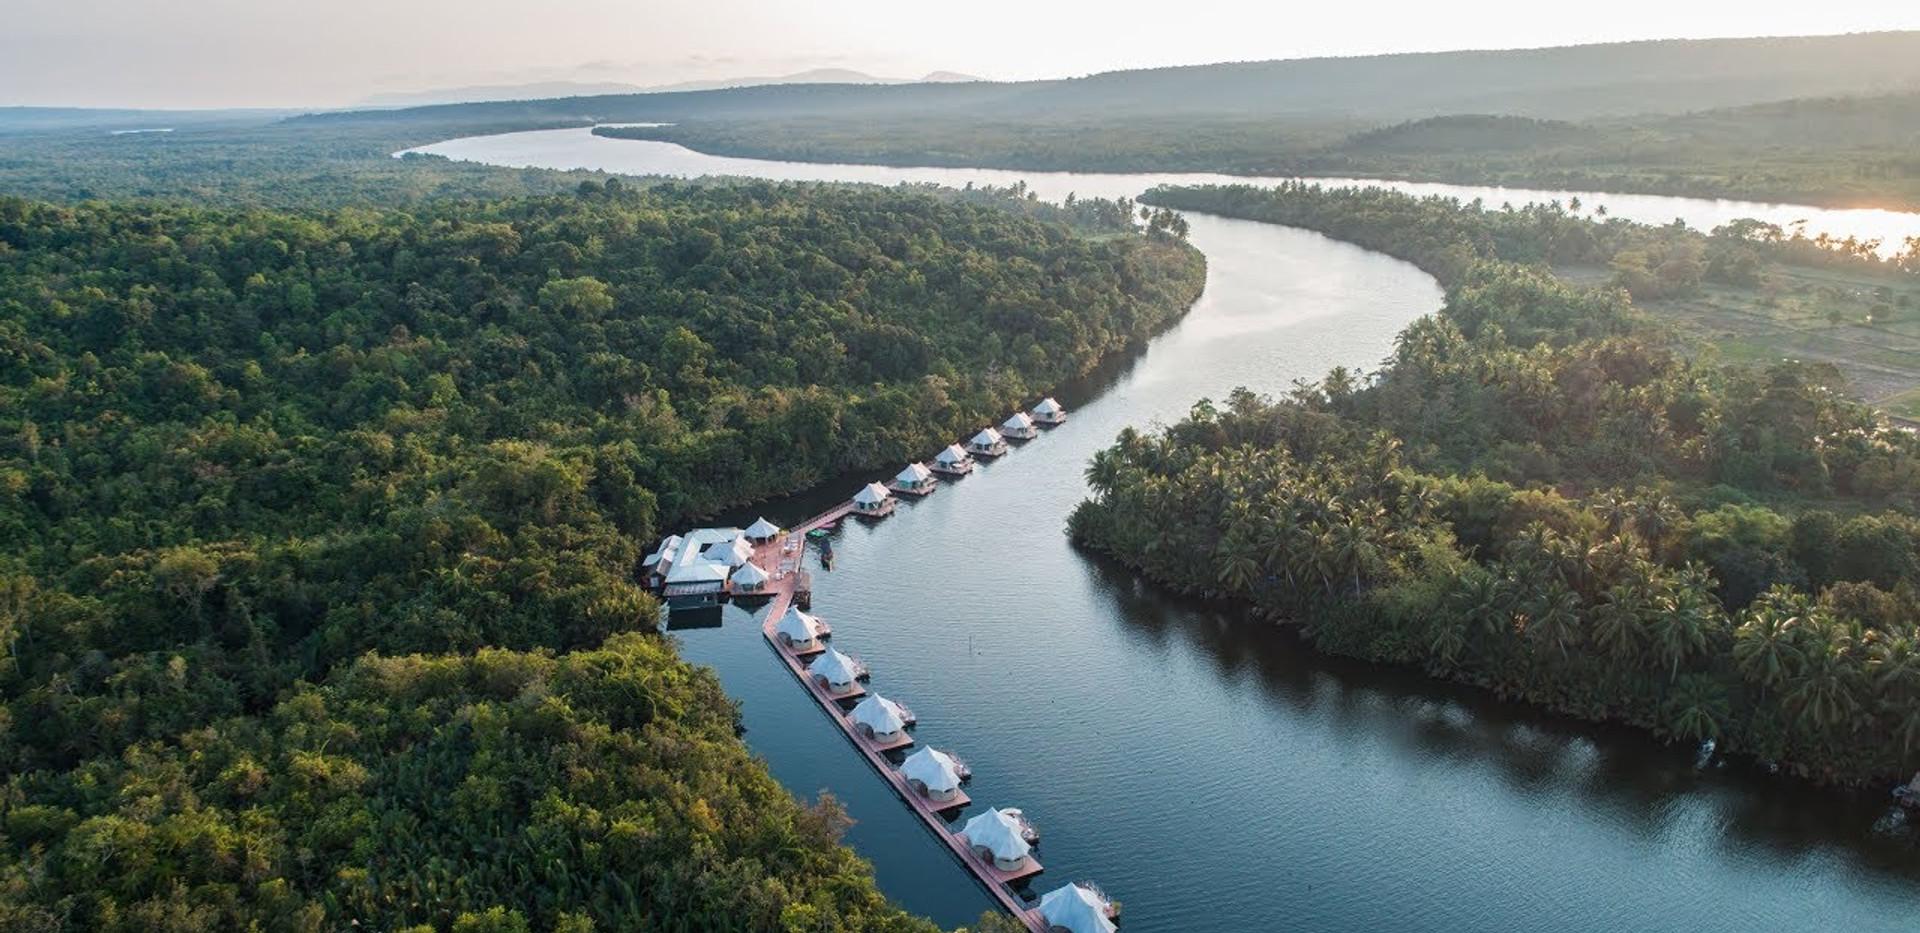 Thailand Yoga Holidays Destination River Resort Video